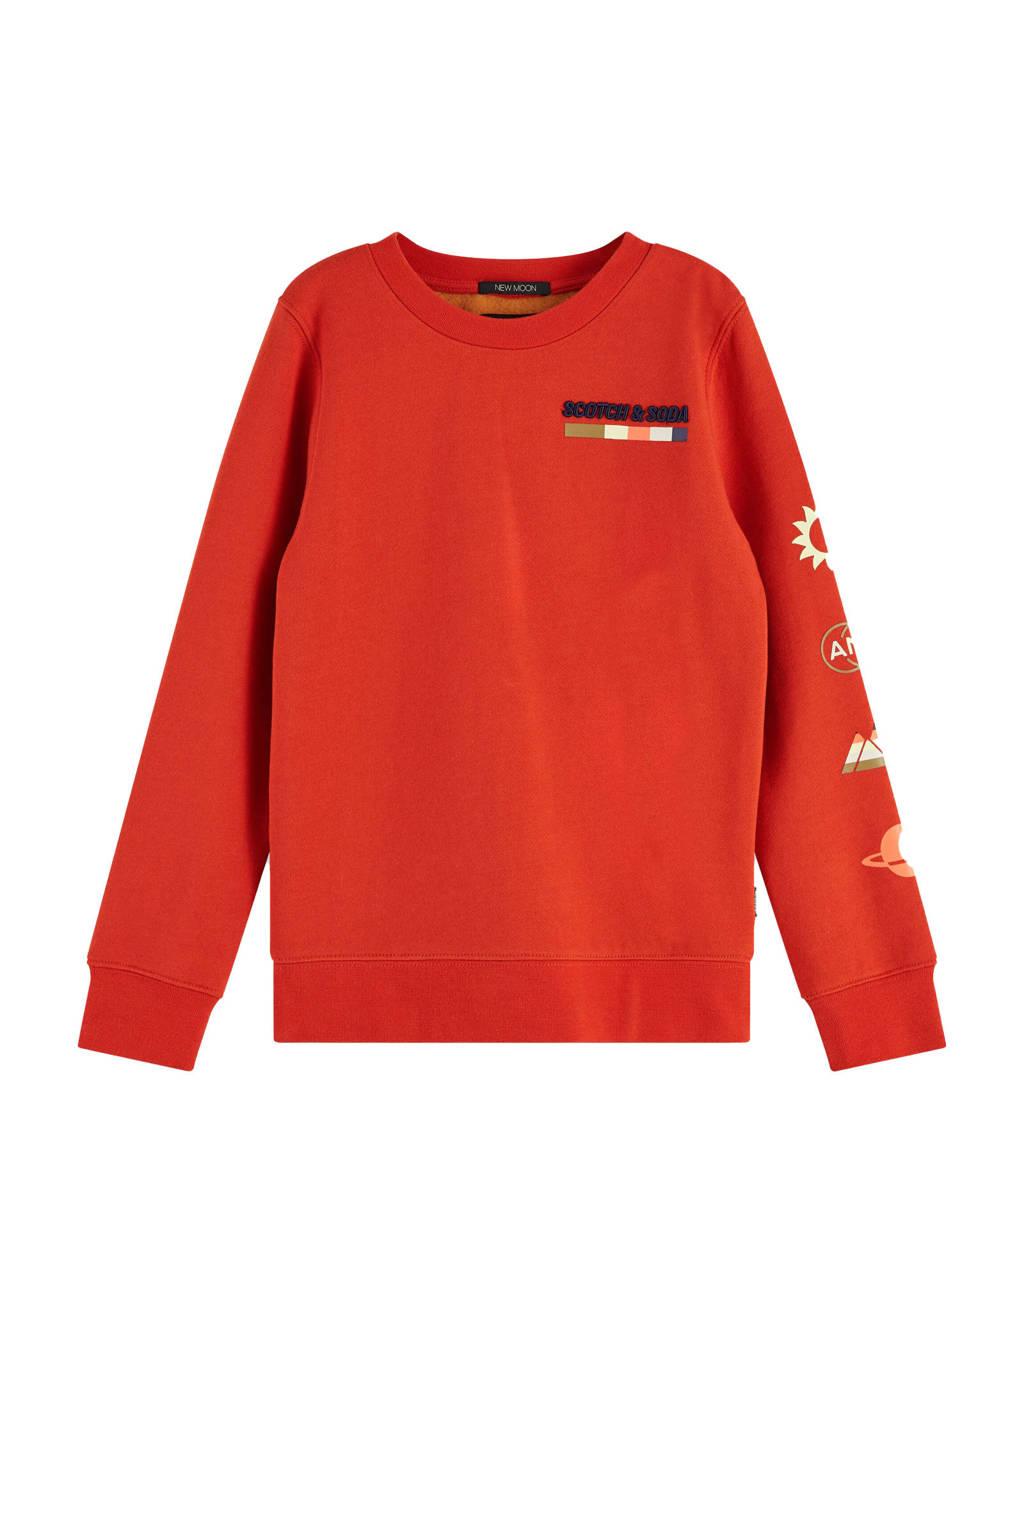 Scotch & Soda sweater met printopdruk rood, Rood